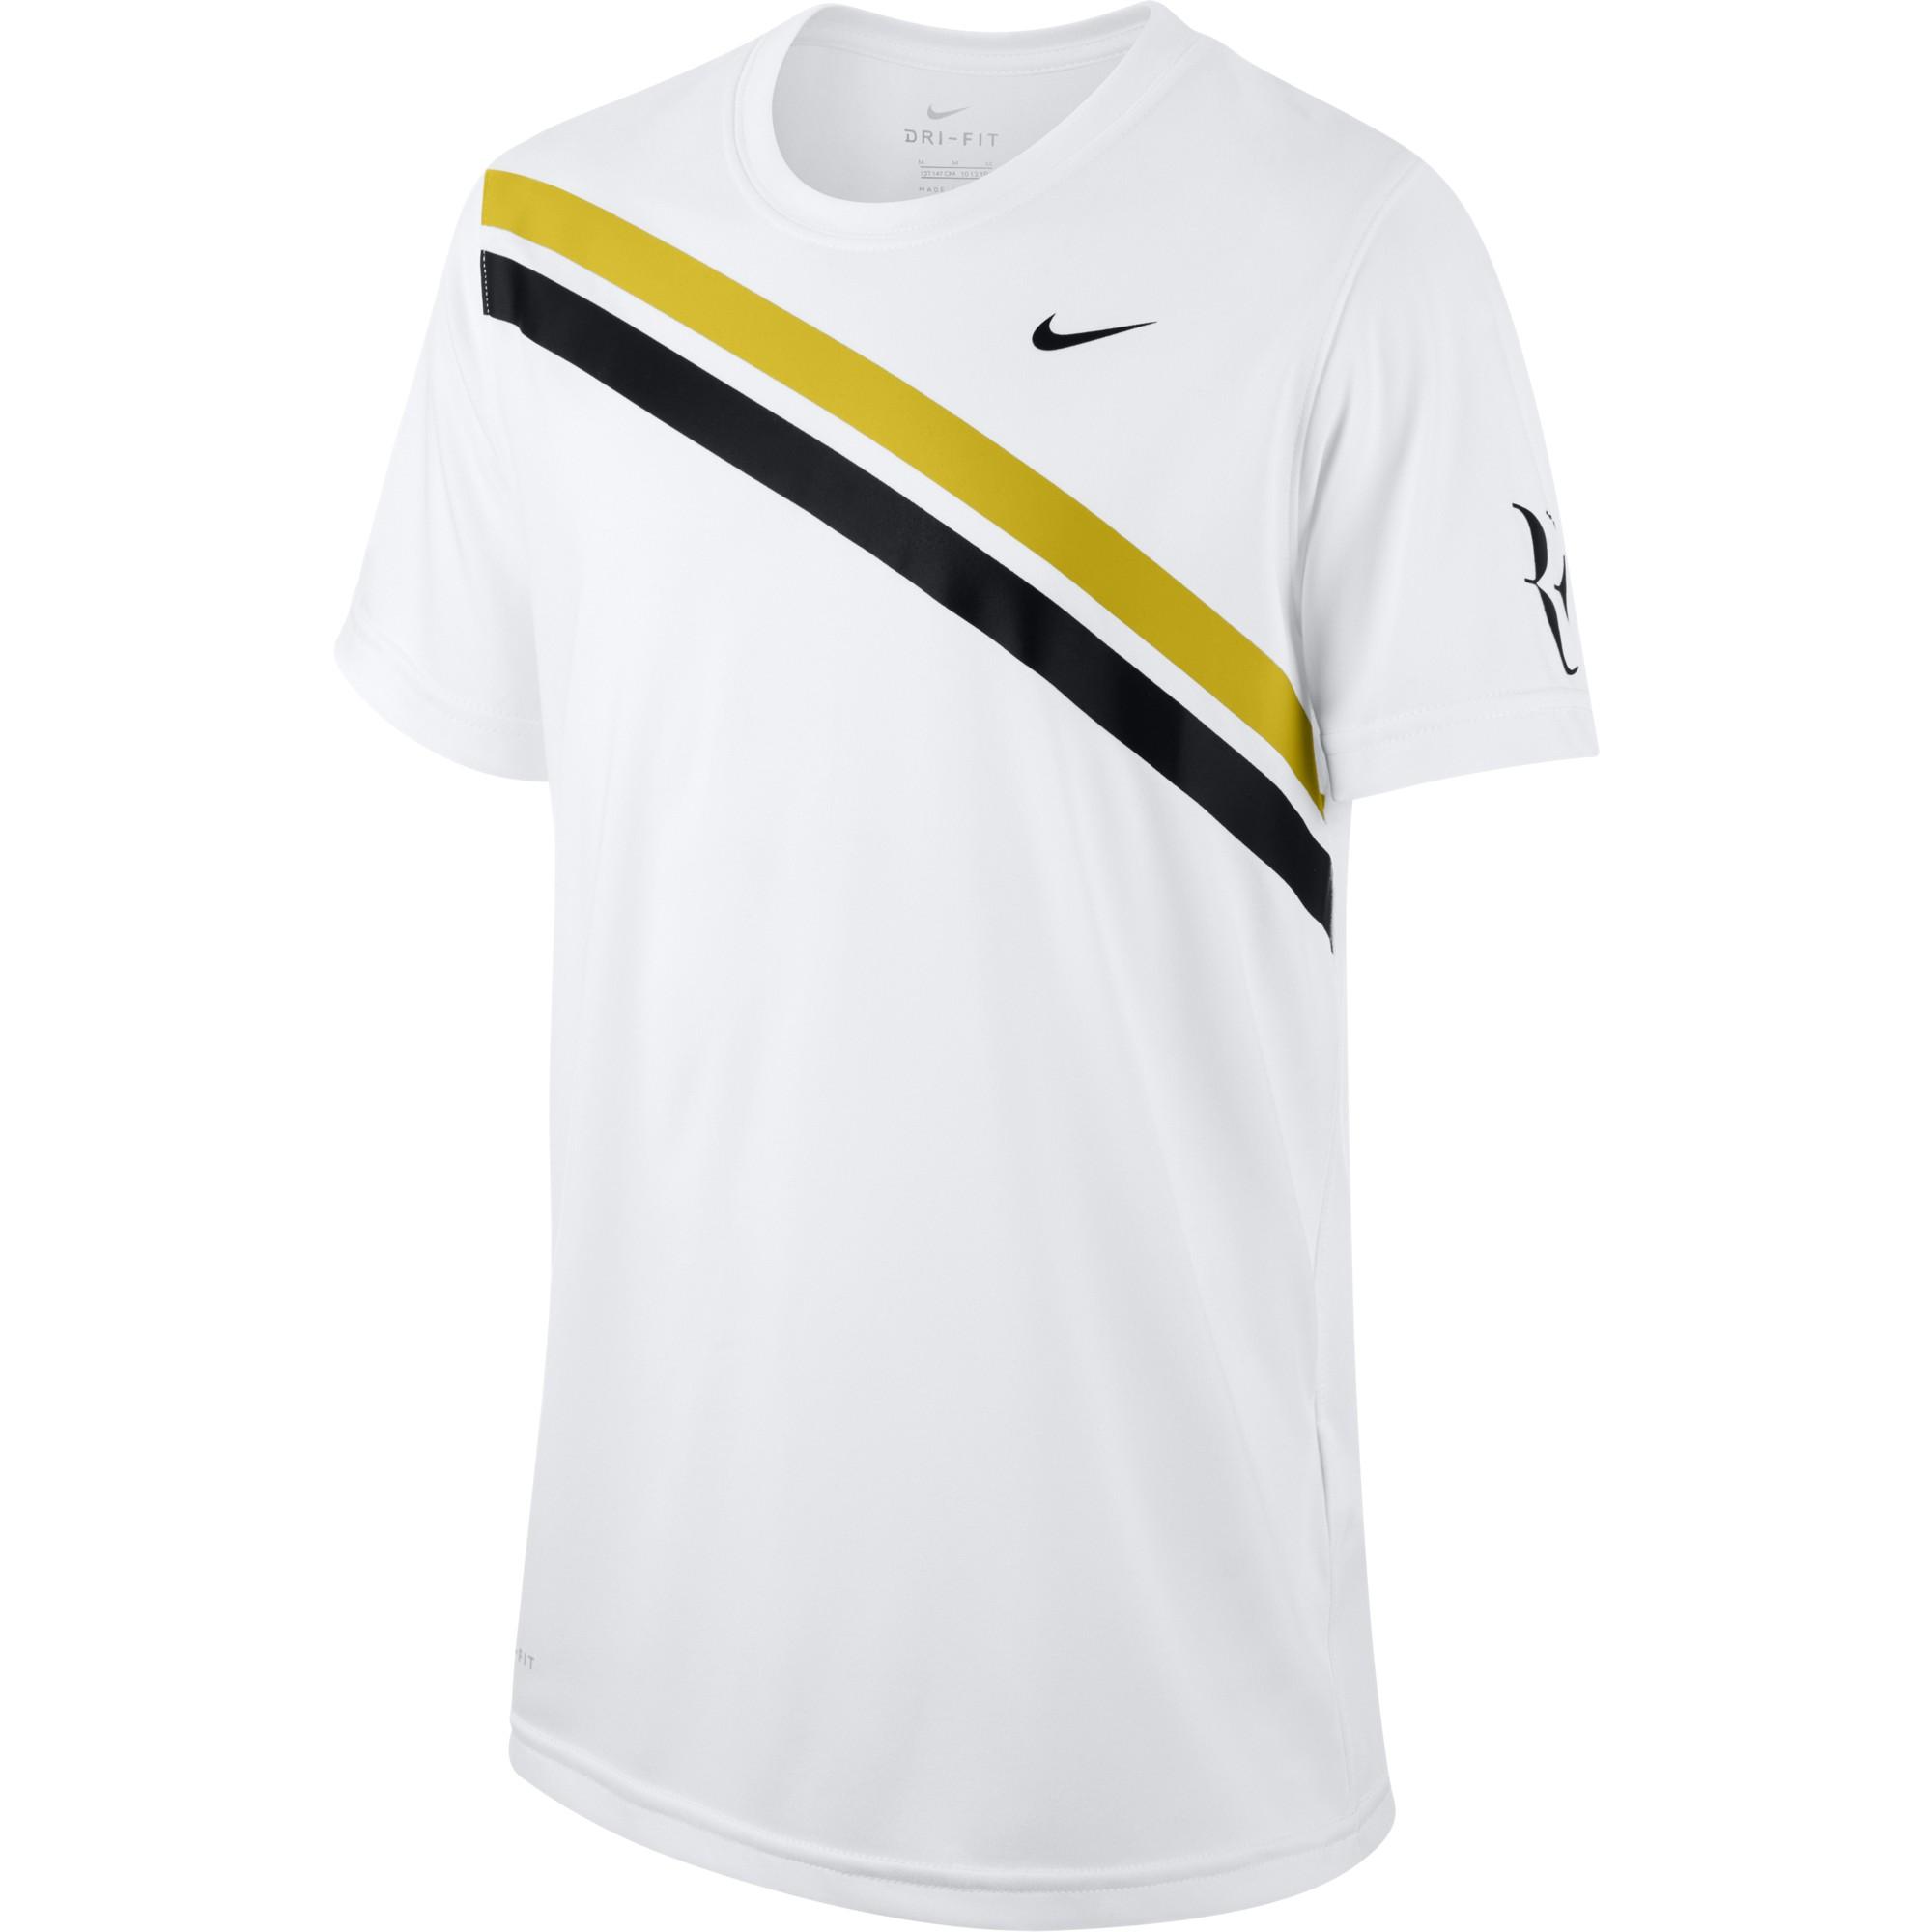 9e25893e28e Chlapecké tenisové tričko Nike Dry RF WHITE BRIGHT CITRON - Tenissport  Březno